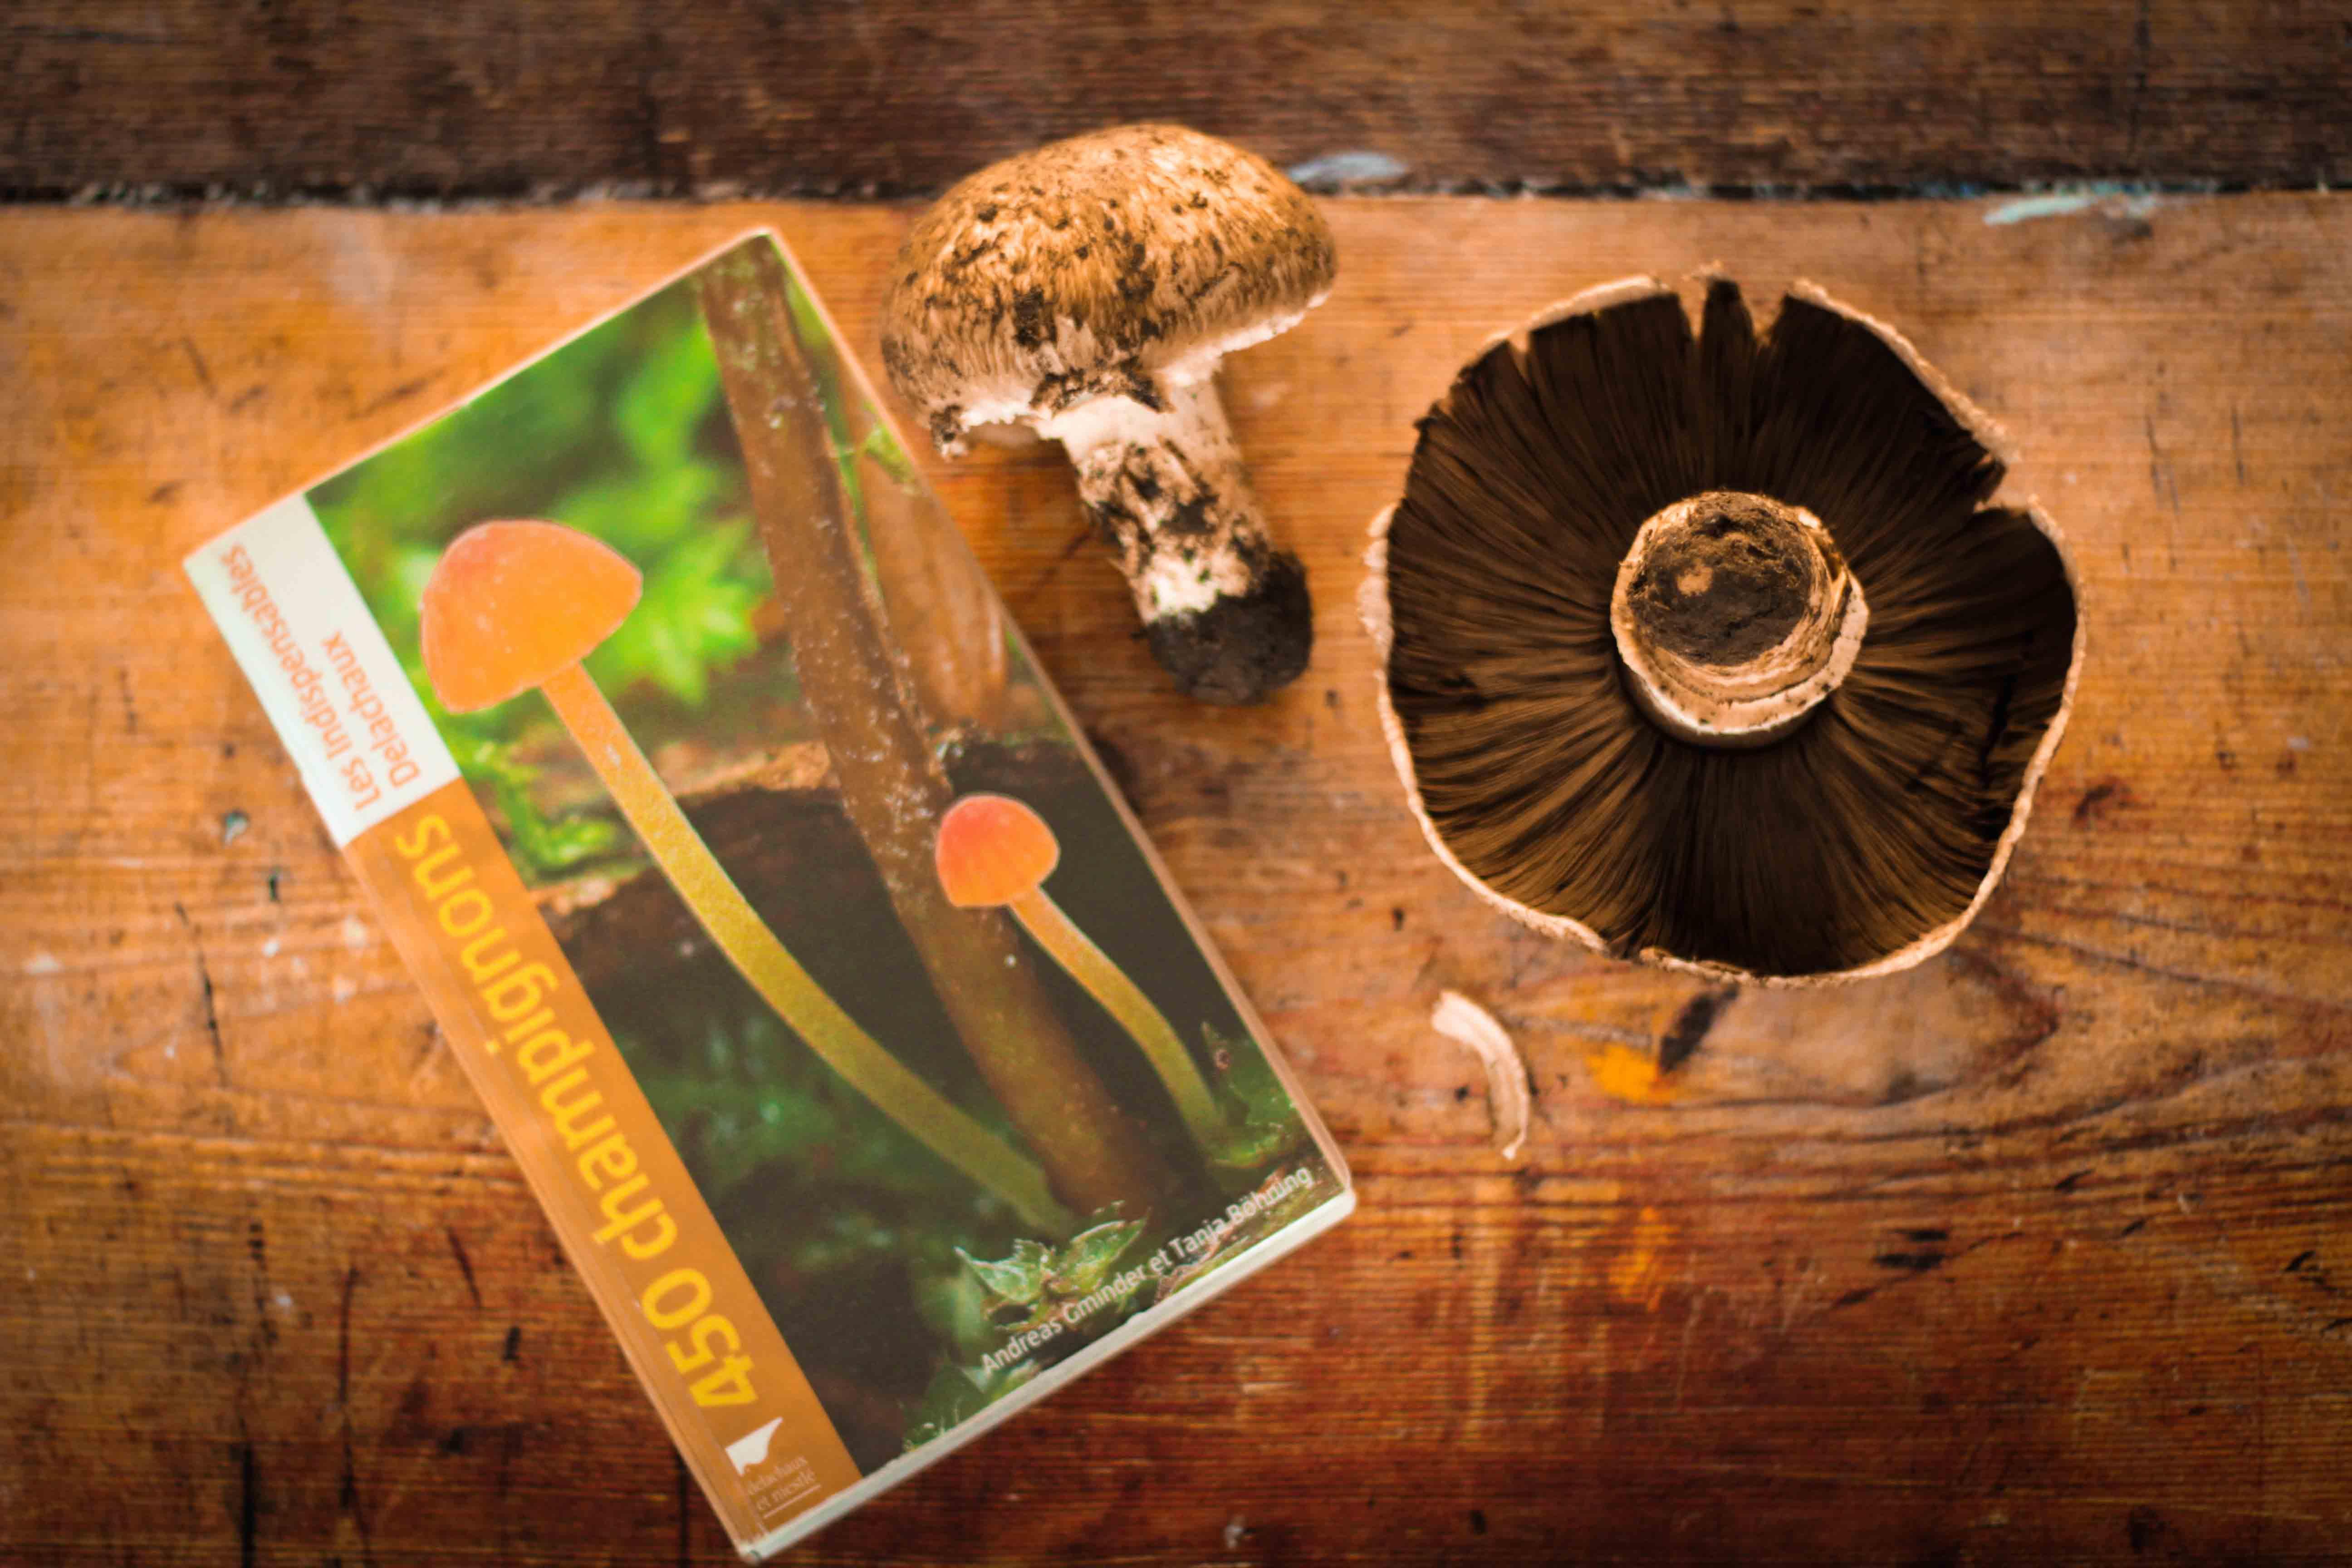 claudialeclercq-edible mushrooms-champignons comestibles_-16